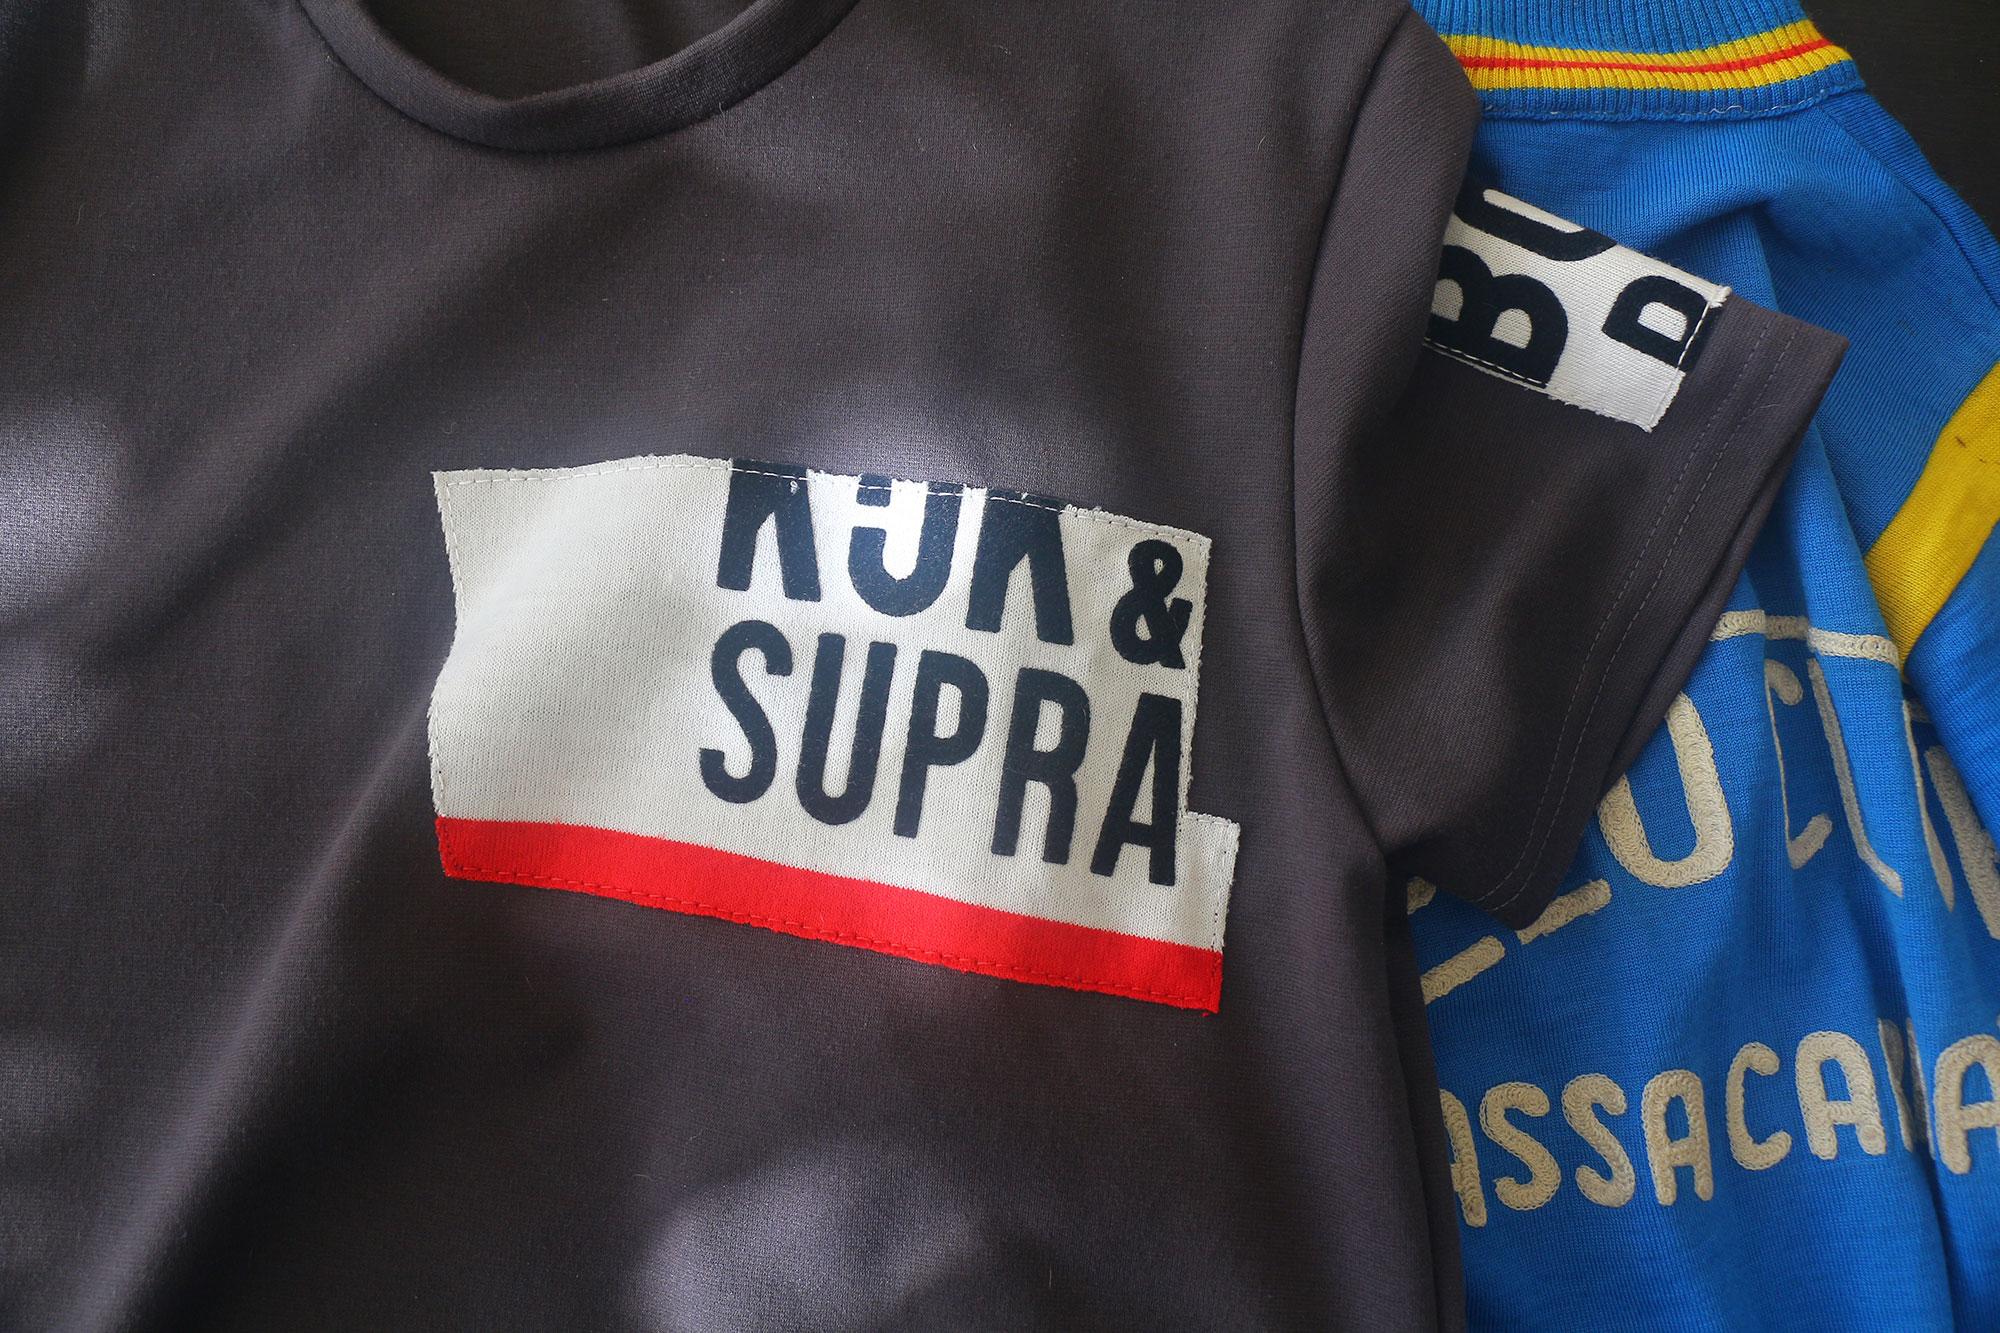 ron-miriello-grafico-san-diego-officina-eroica-vintage-cycling-jersey-maglia-bici-branding-11.jpg